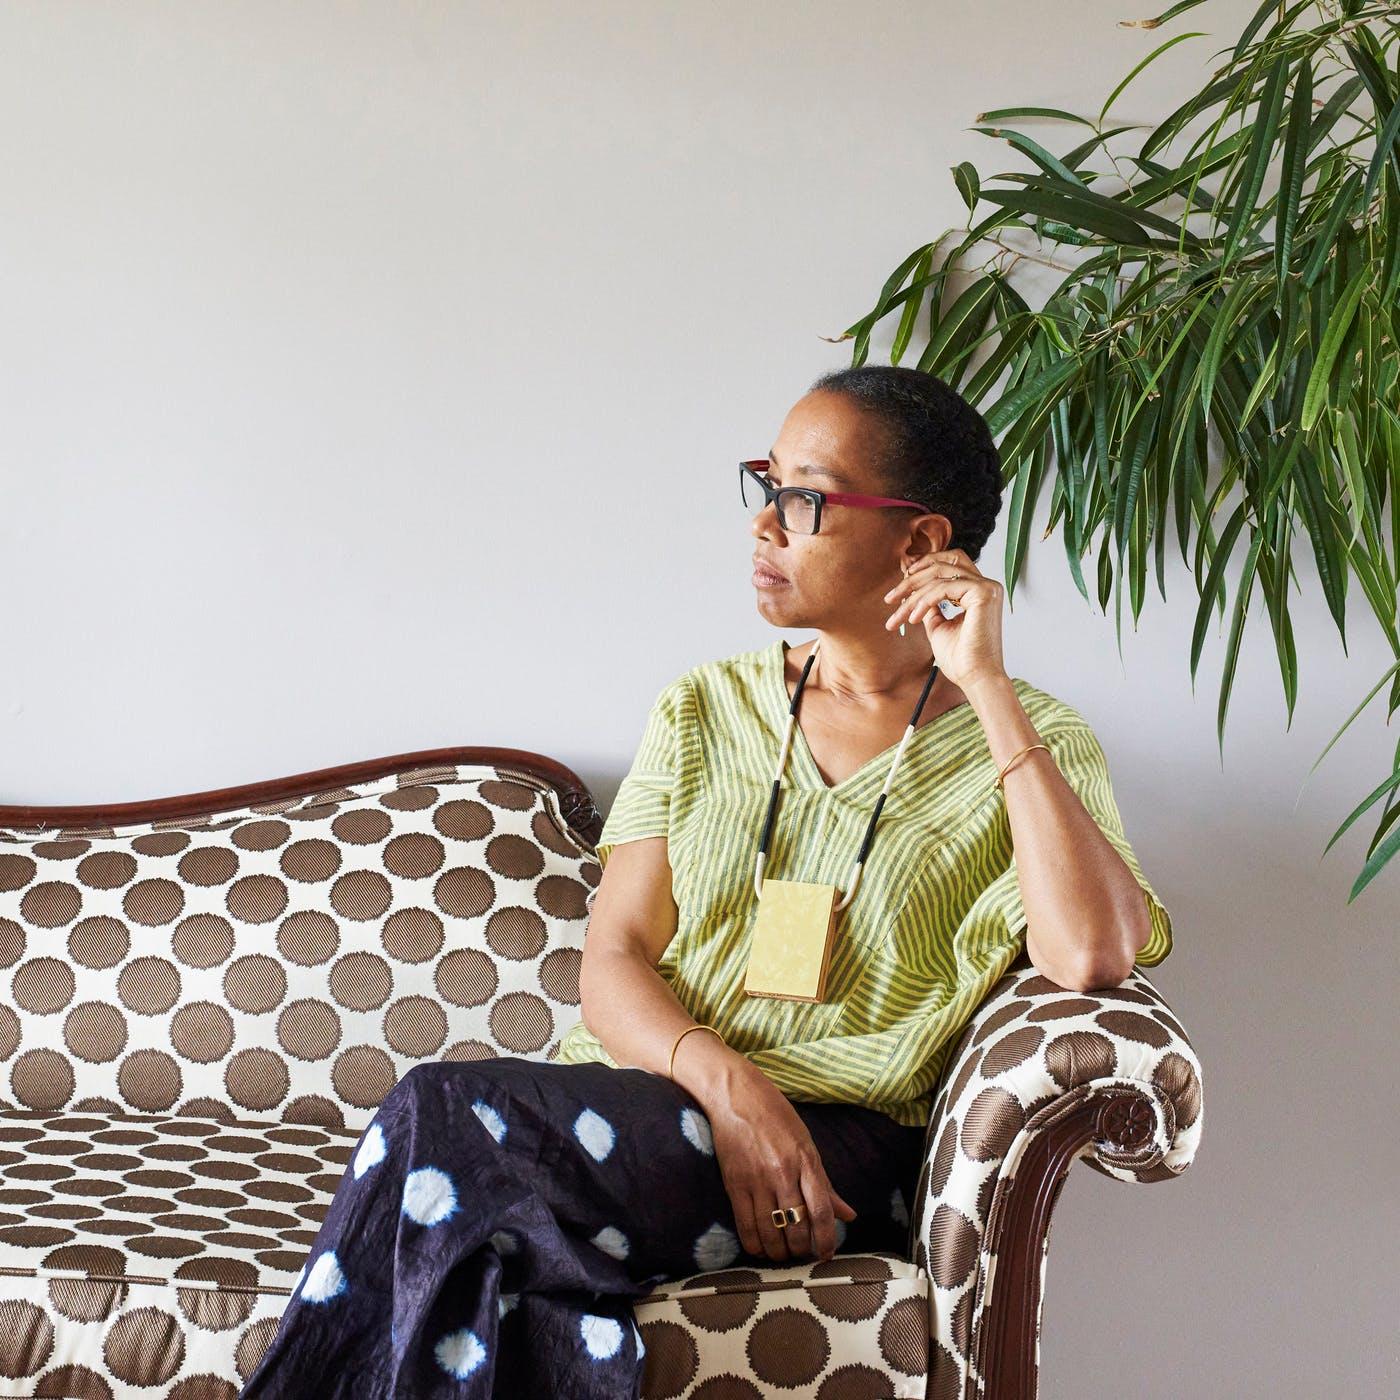 Photo of artist Sonya Clark on sofa beside a houseplant